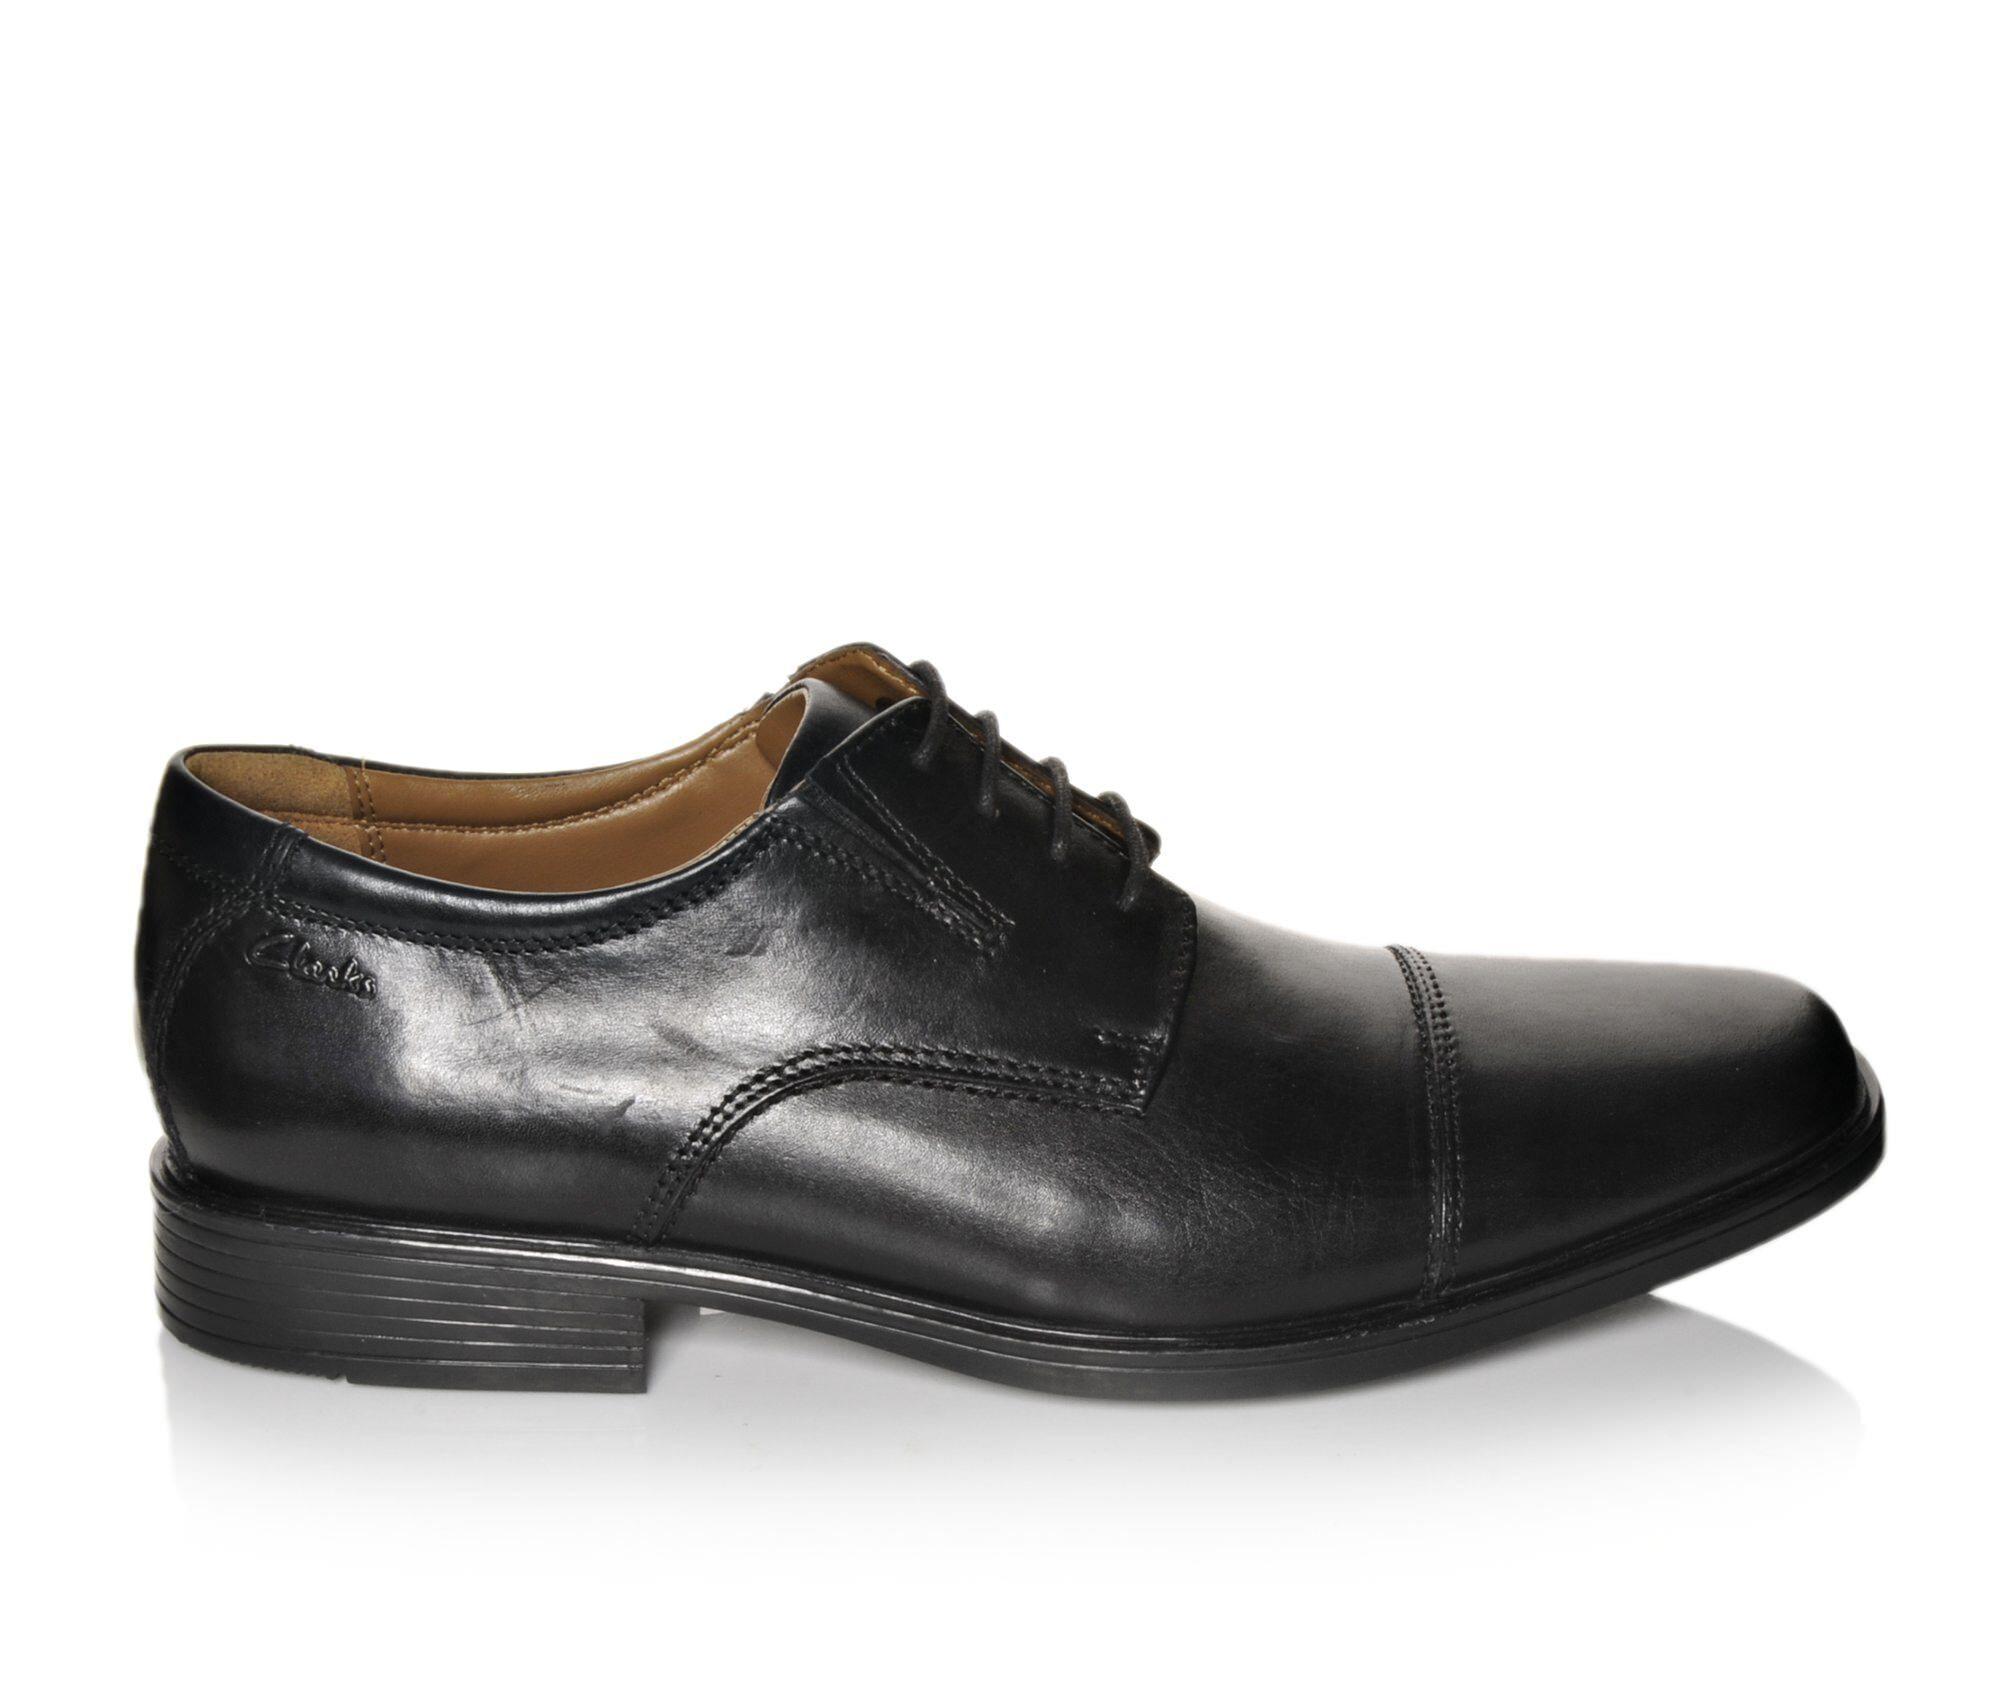 Men's Clarks Tilden Cap Dress Shoes Black